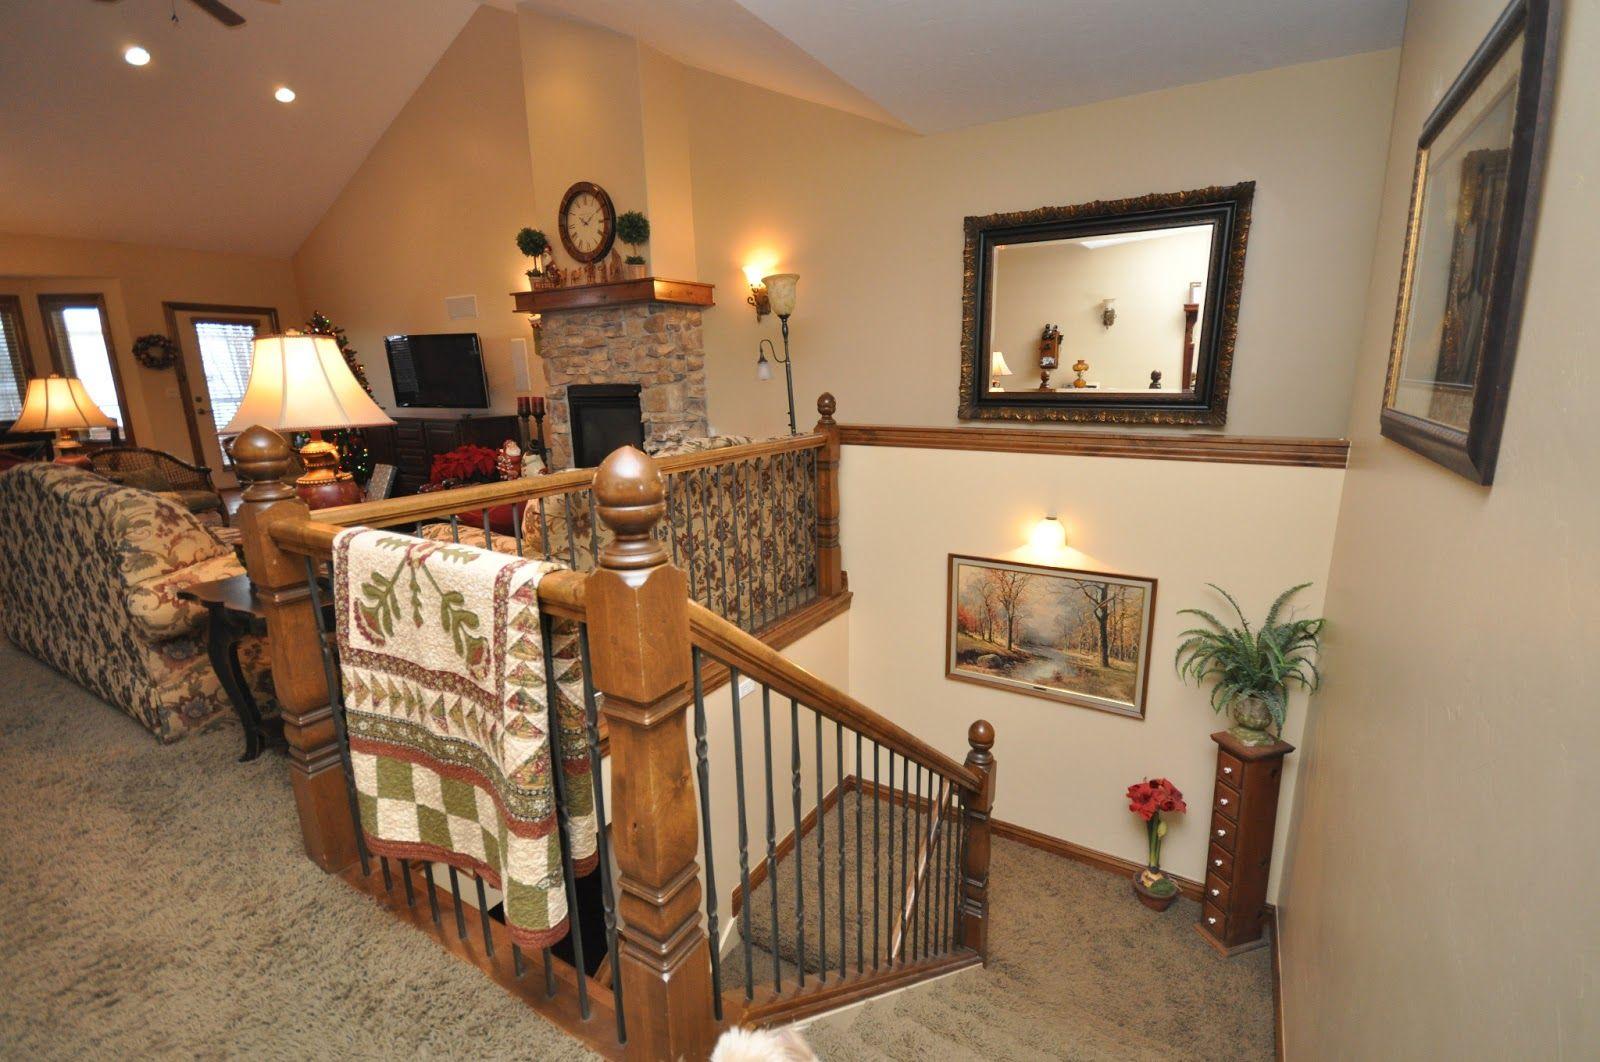 open basement steps - Google Search | Basement steps, Open ...